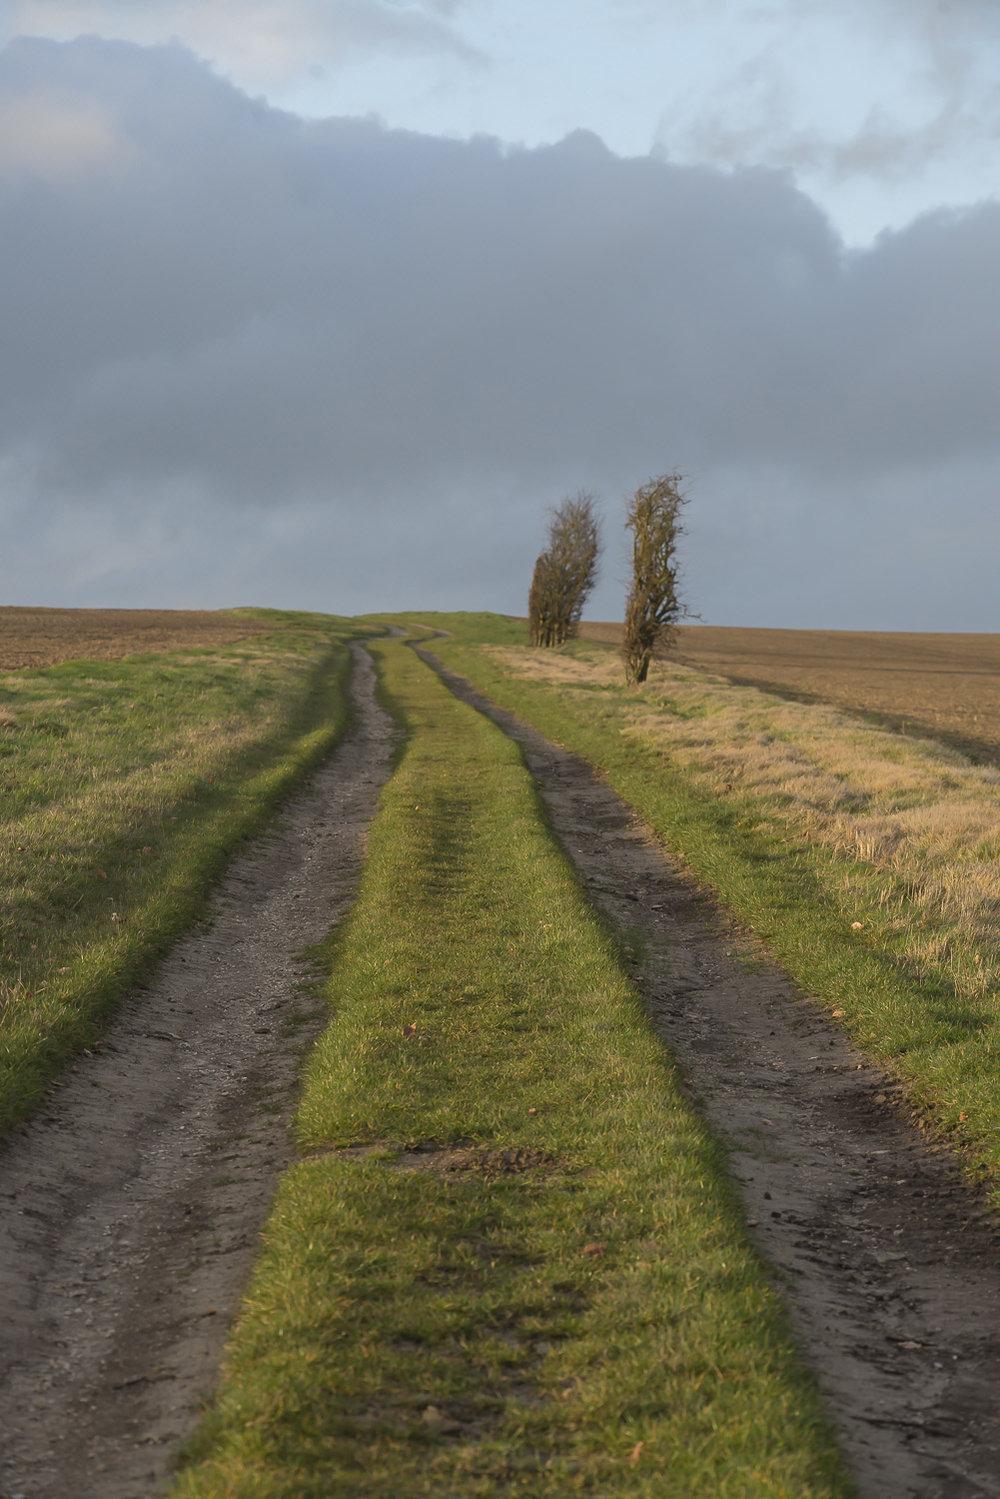 Oxfordshire-Ridgeway-winter-Jo-Kearney-photos-landscape-photography-video-landscapes.jpg